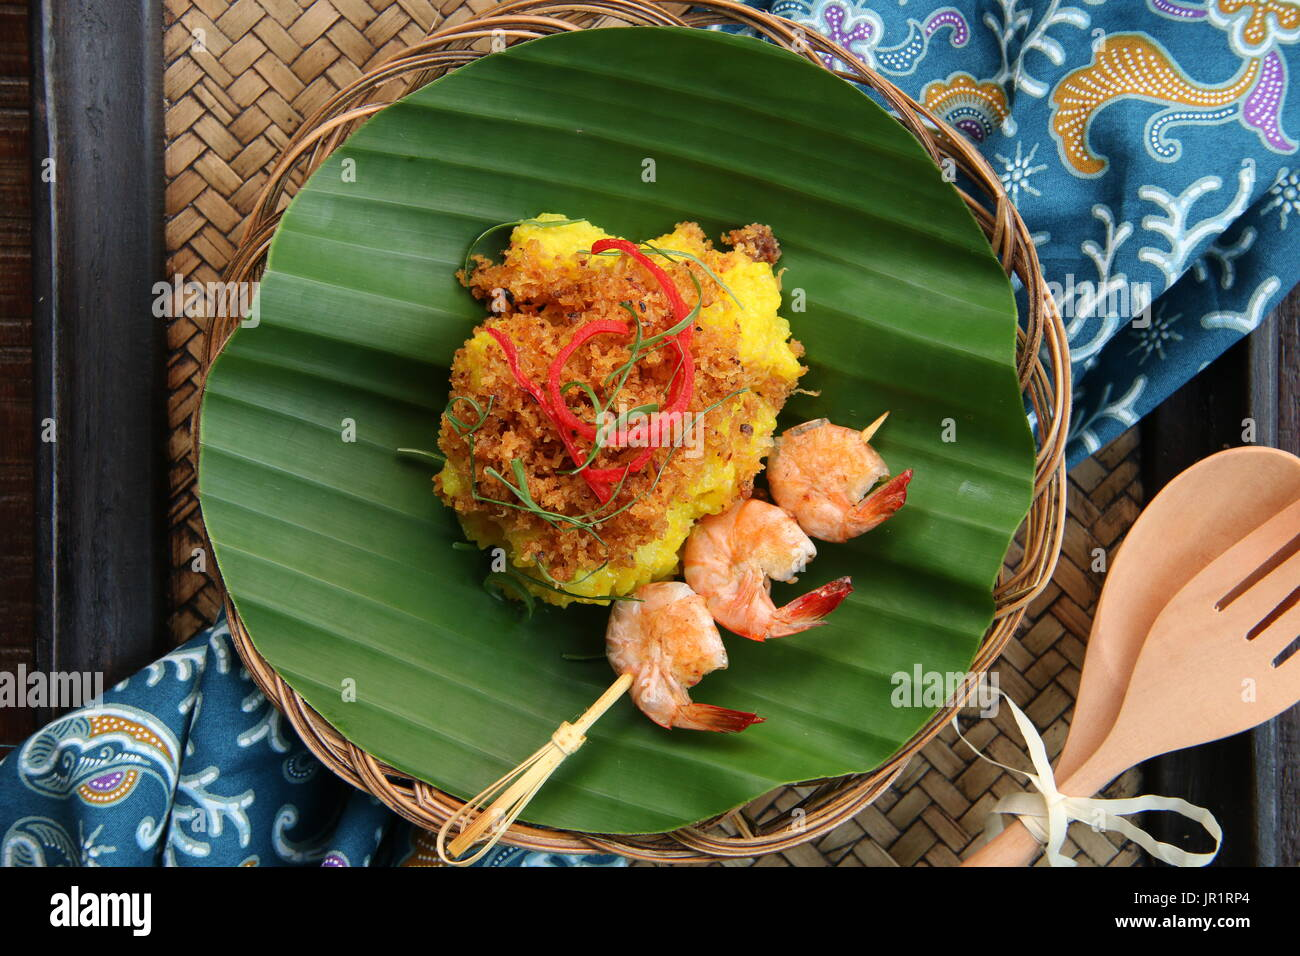 Ketan Serundeng Udang. Turmeric Sticky Rice with Roasted Coconut and Shrimp Satay - Stock Image